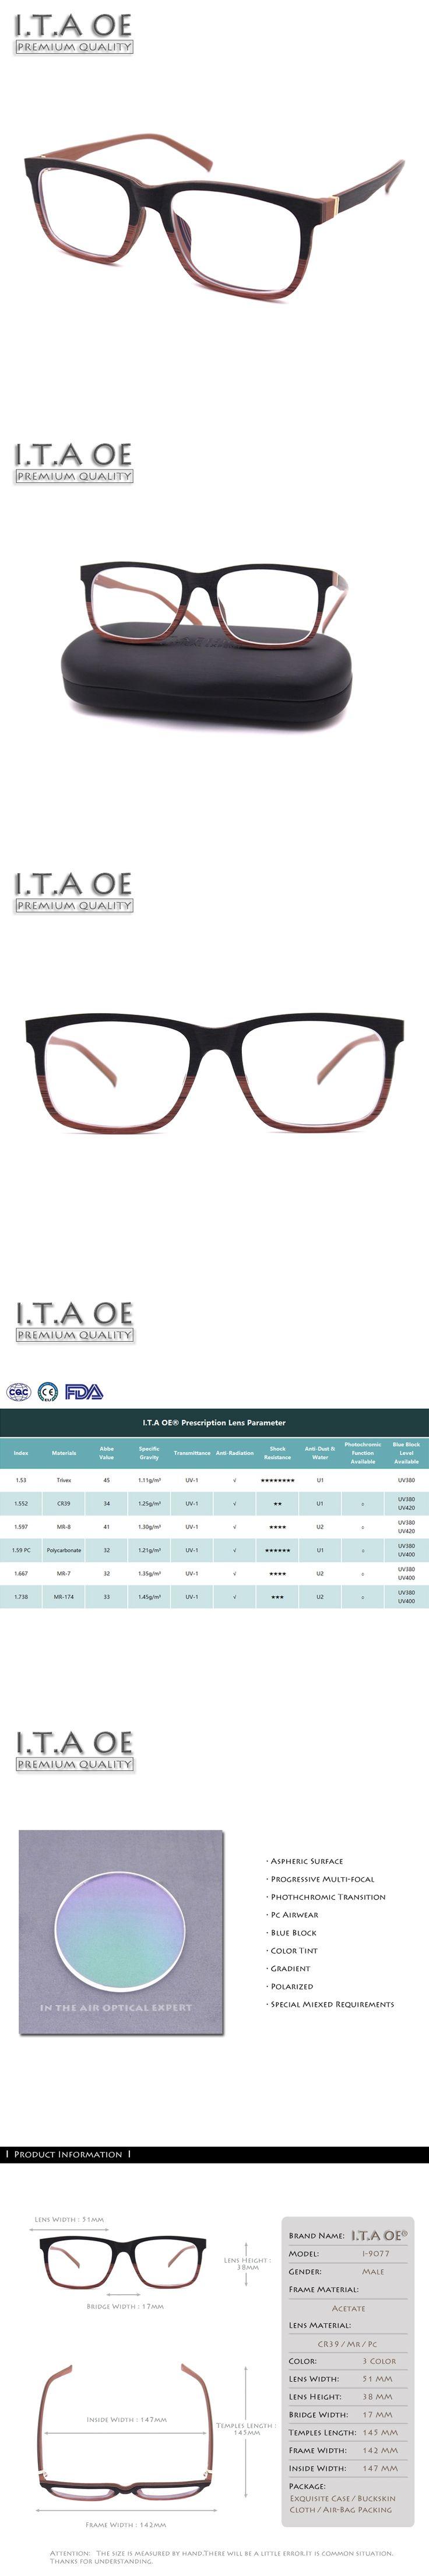 ITAOE Model Laker Quality Wood-like Acetate Men Optical Prescription Glasses Eyewear Frames Spectacles 142mm